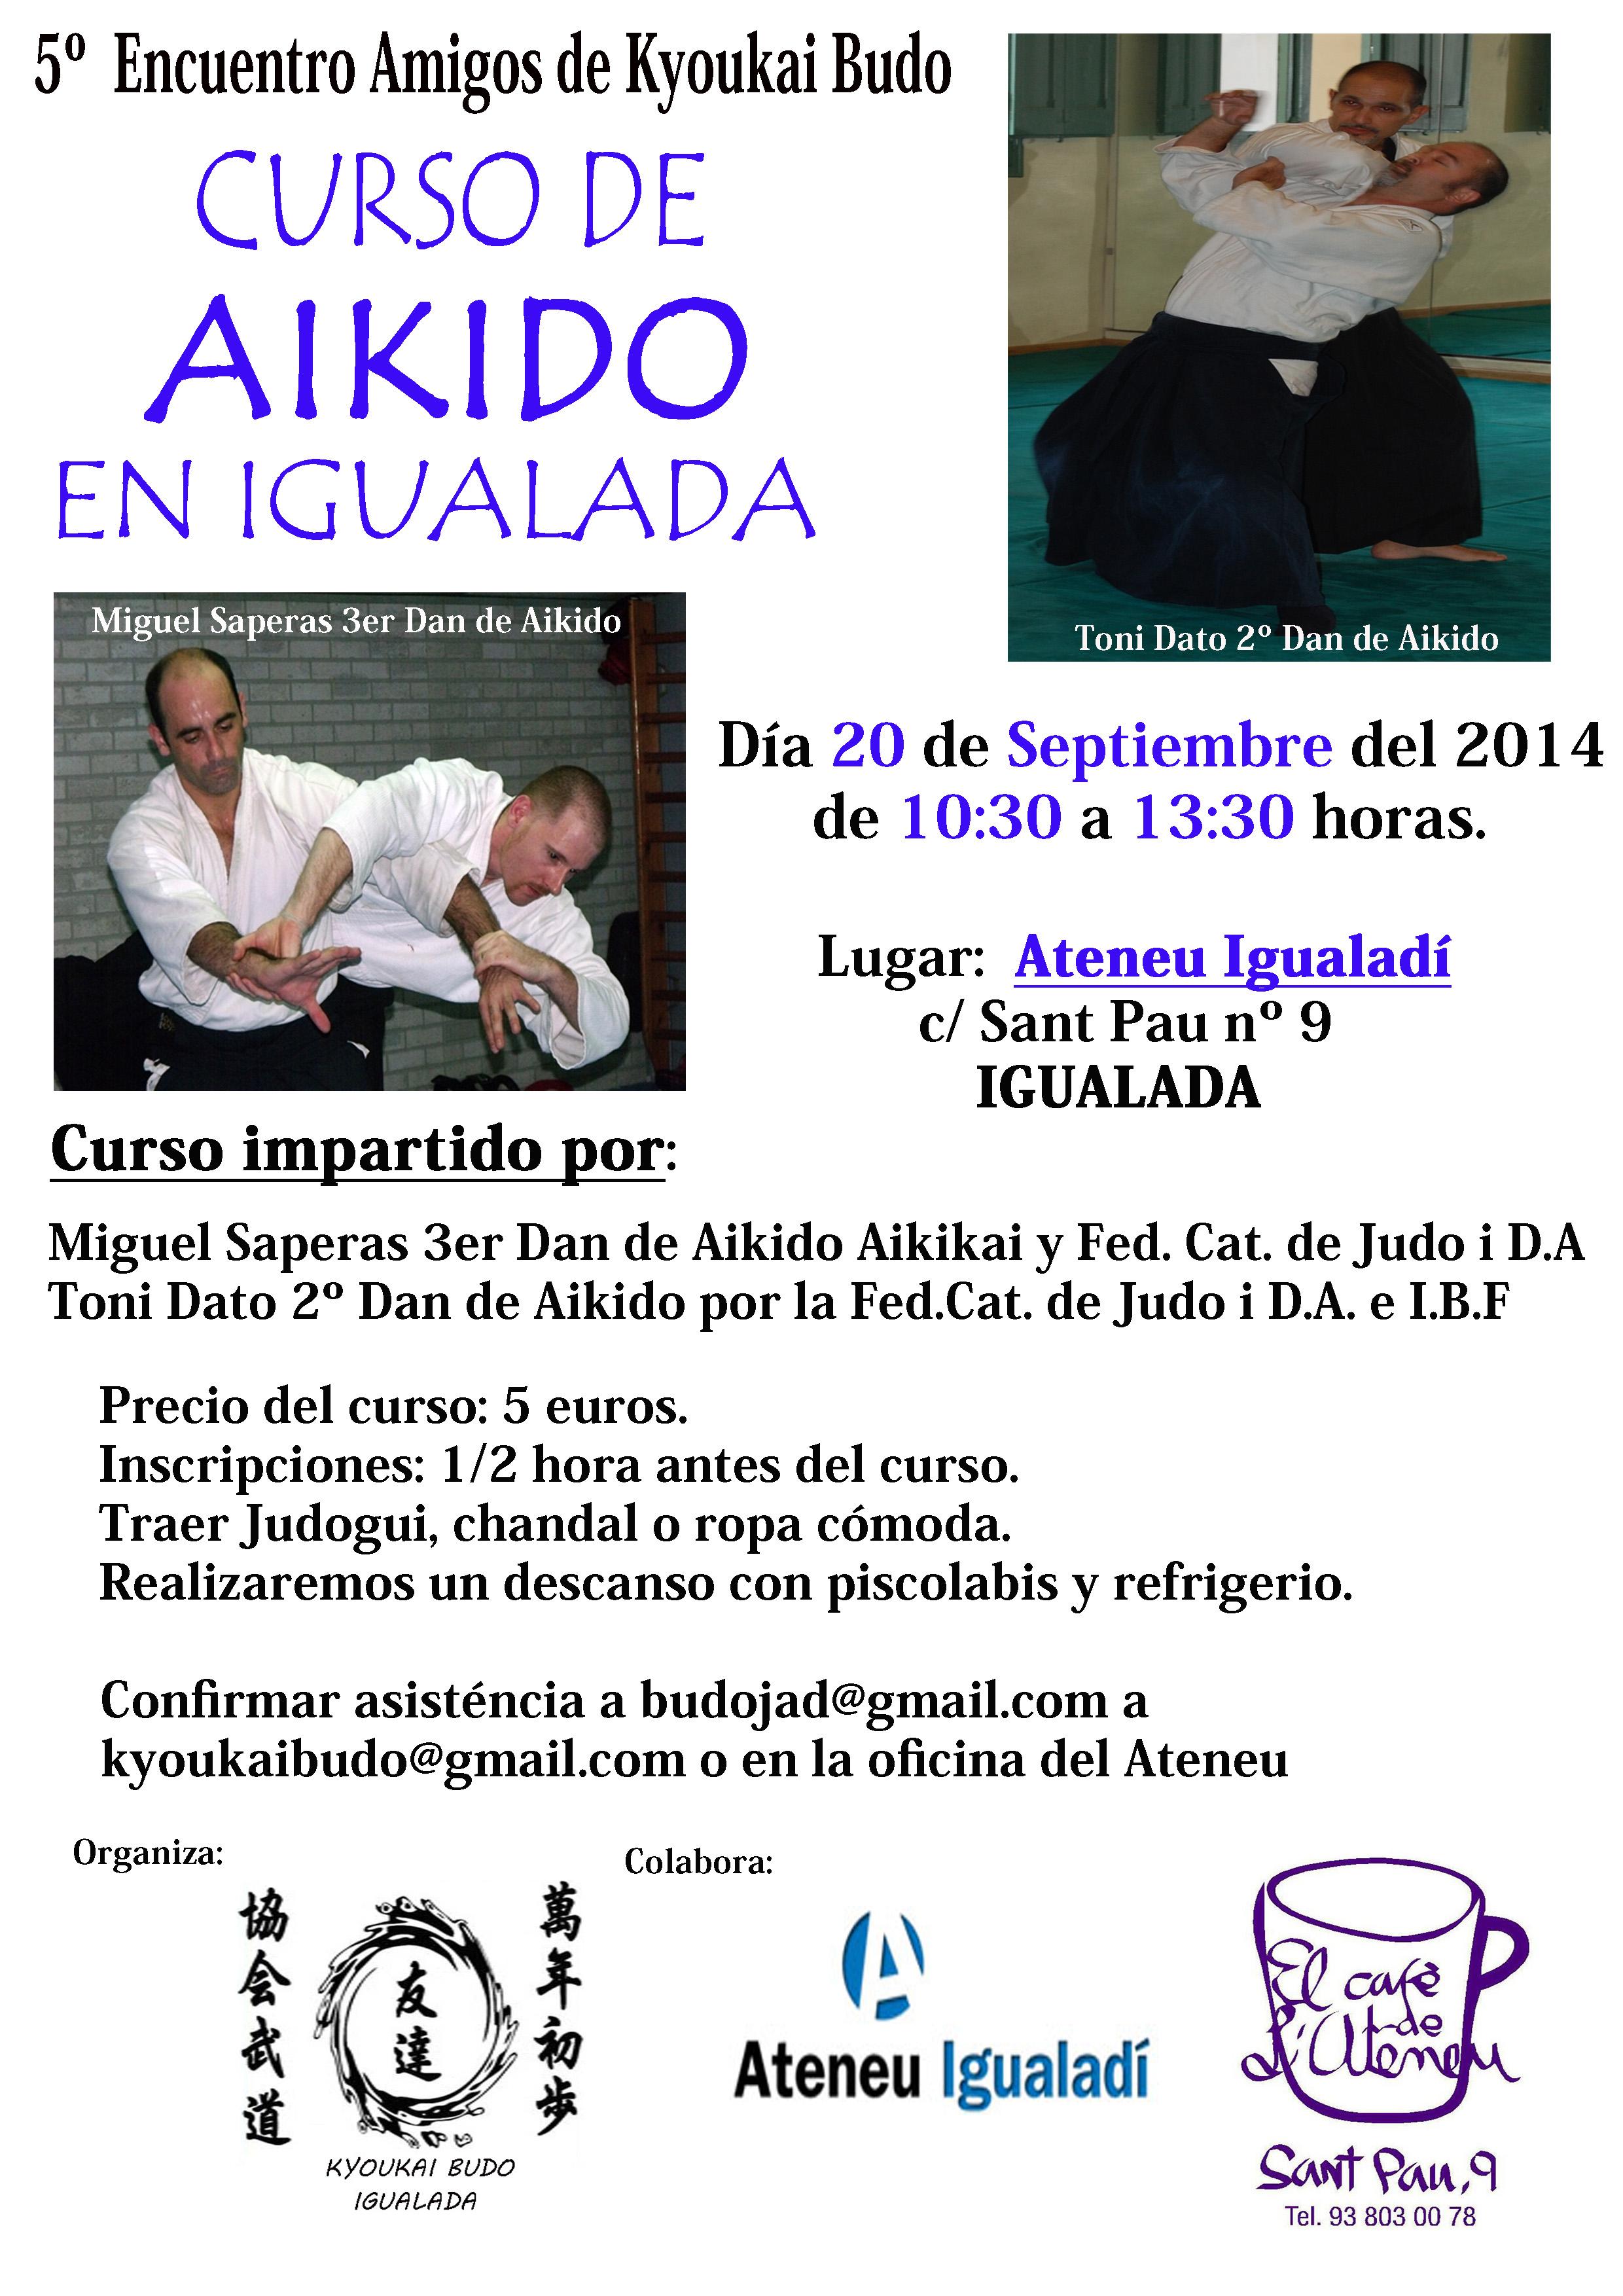 Curso Aikido Septiembre Igualada 2014-1 copia